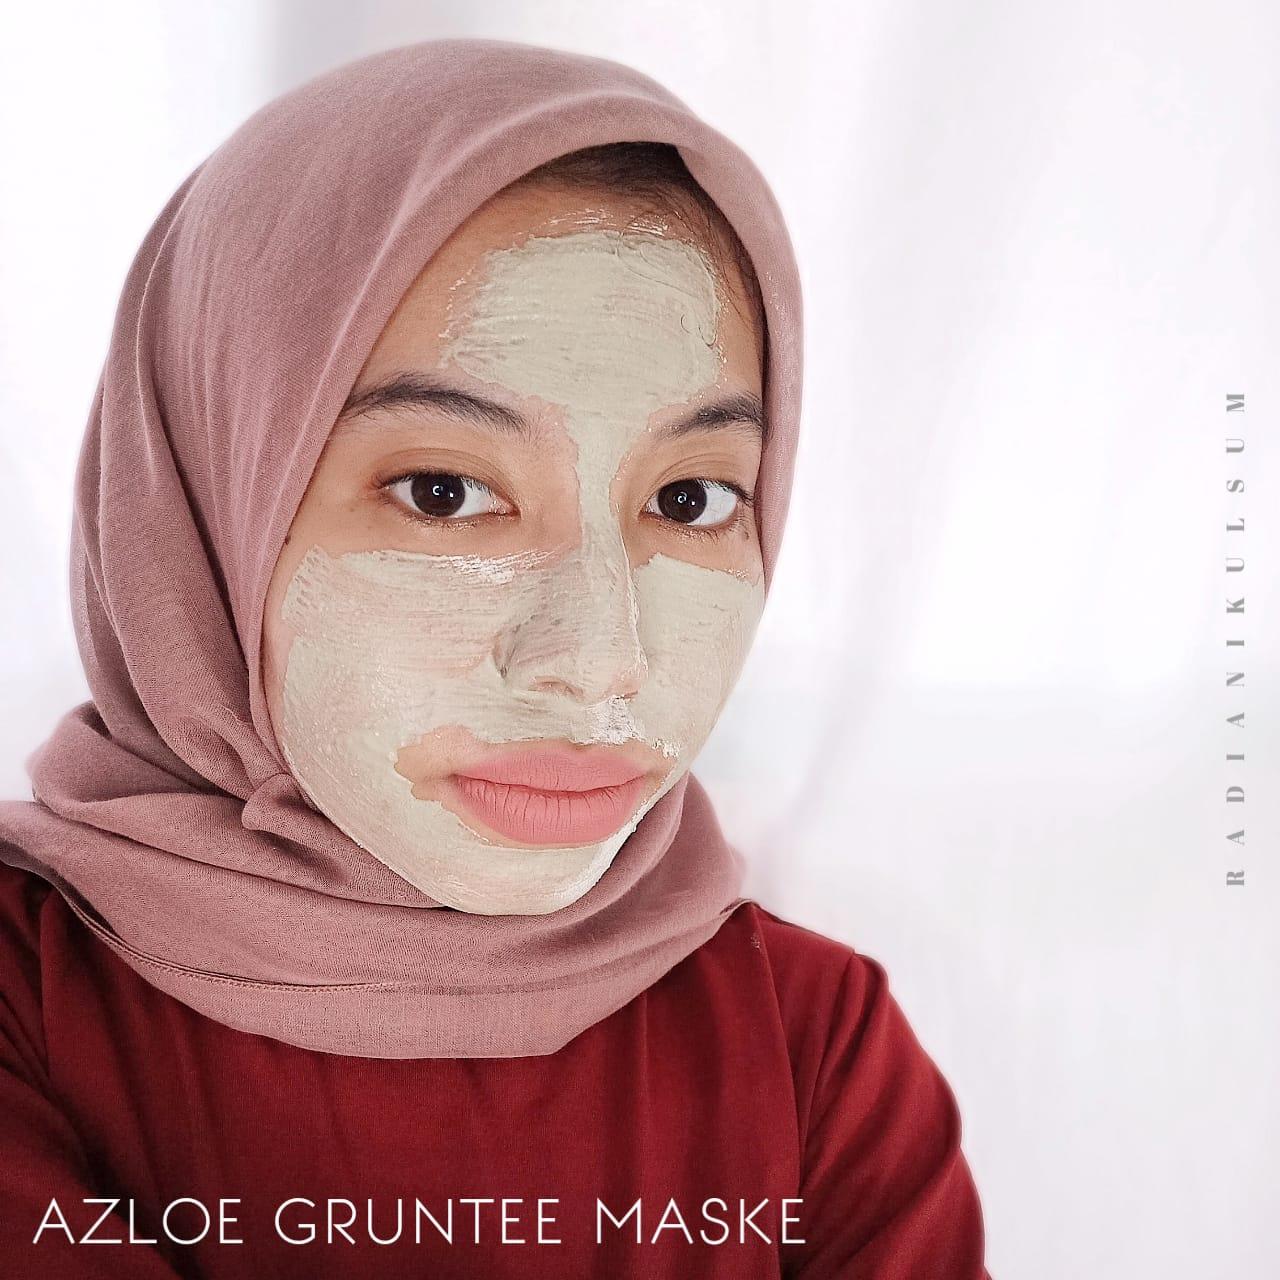 Pemakaian Azloe Gruntee Maske